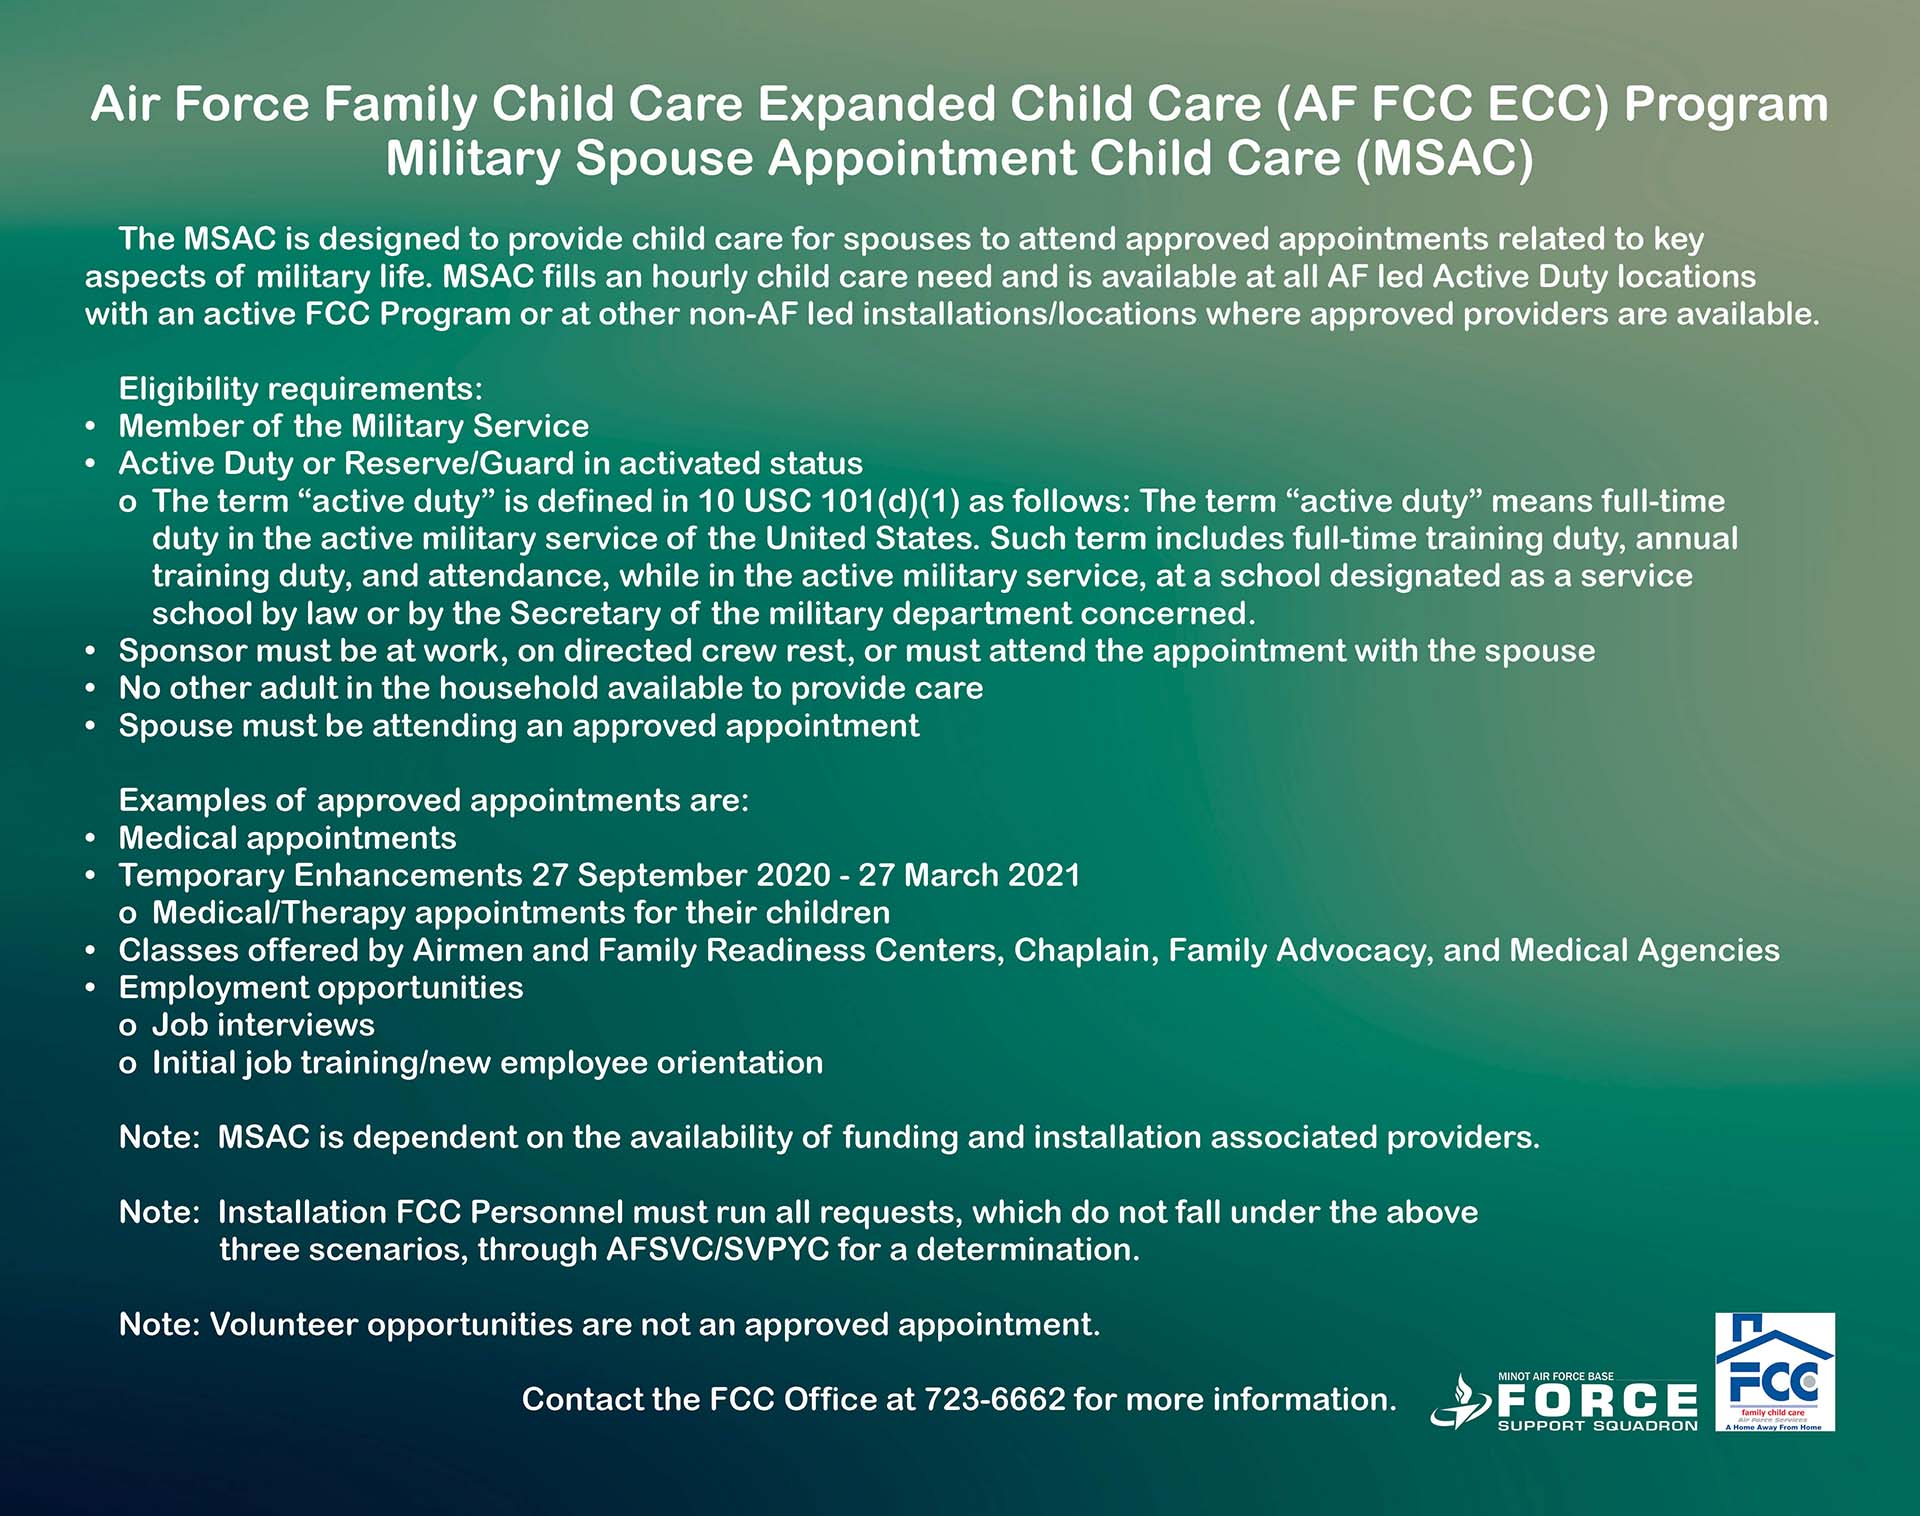 03.21 AF FCC ECC Military Spouse Appointment Child Care - Sept 2020